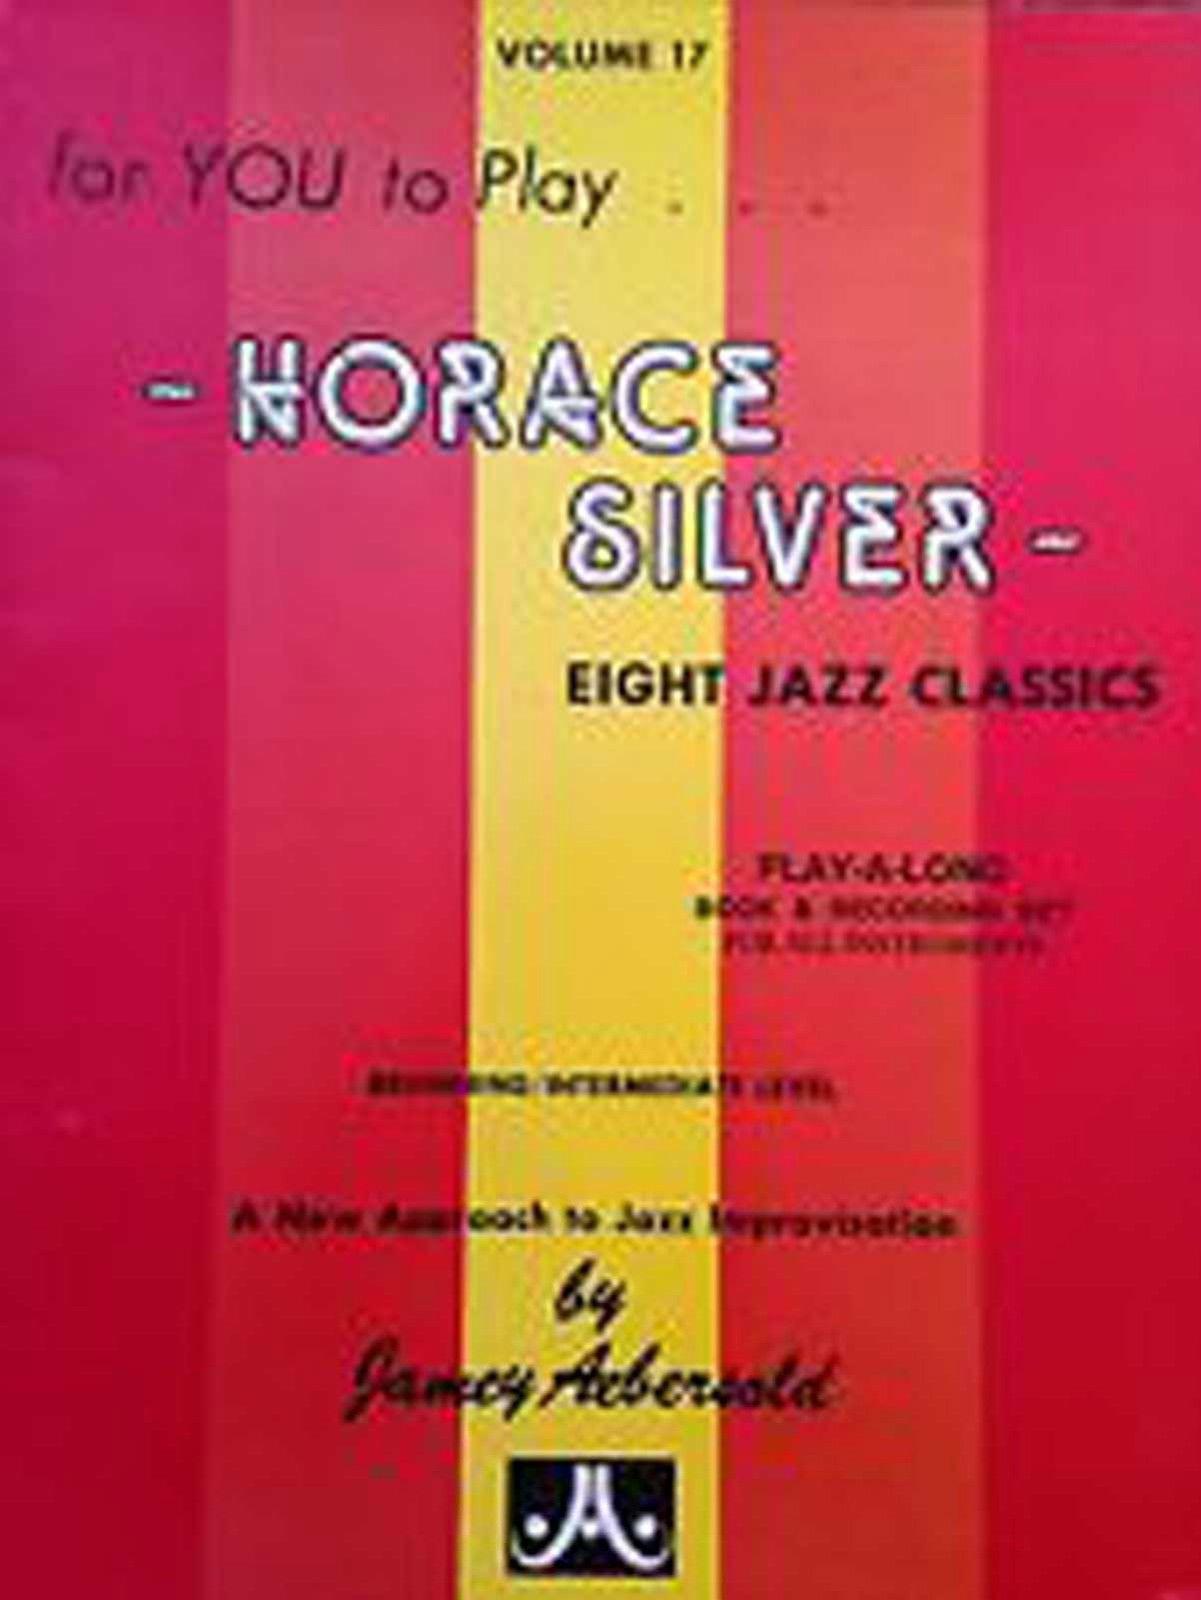 Horace Silver Volume 17 Jazz Classics Improvisation Book B84